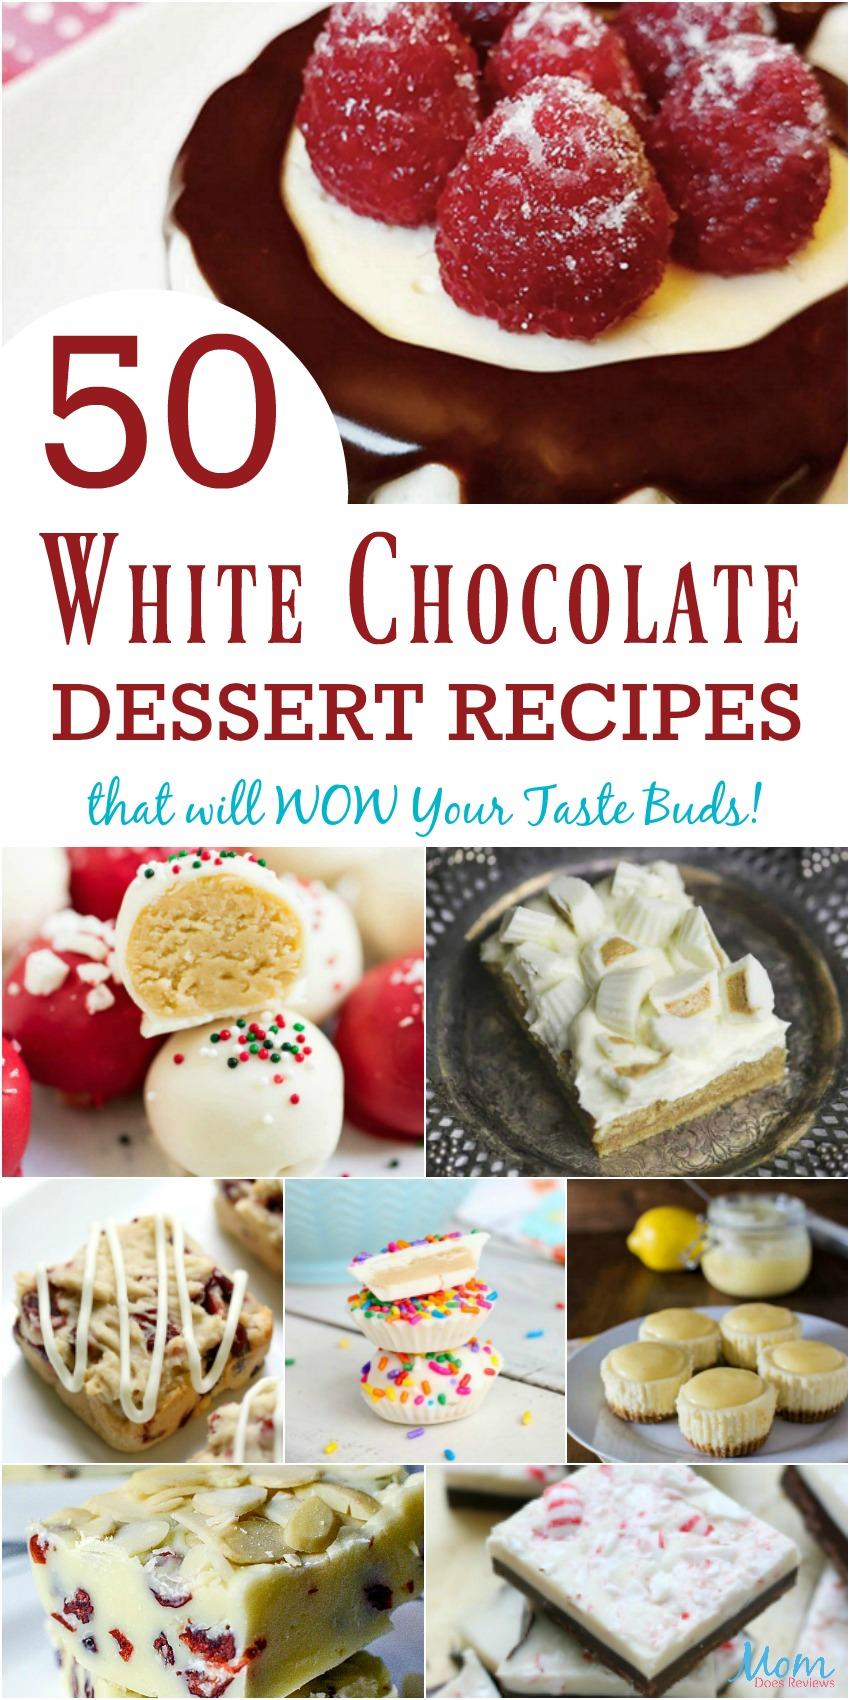 50 White Chocolate Dessert Recipes that will WOW Your Taste Buds! #recipes #whitechocolate #desserts